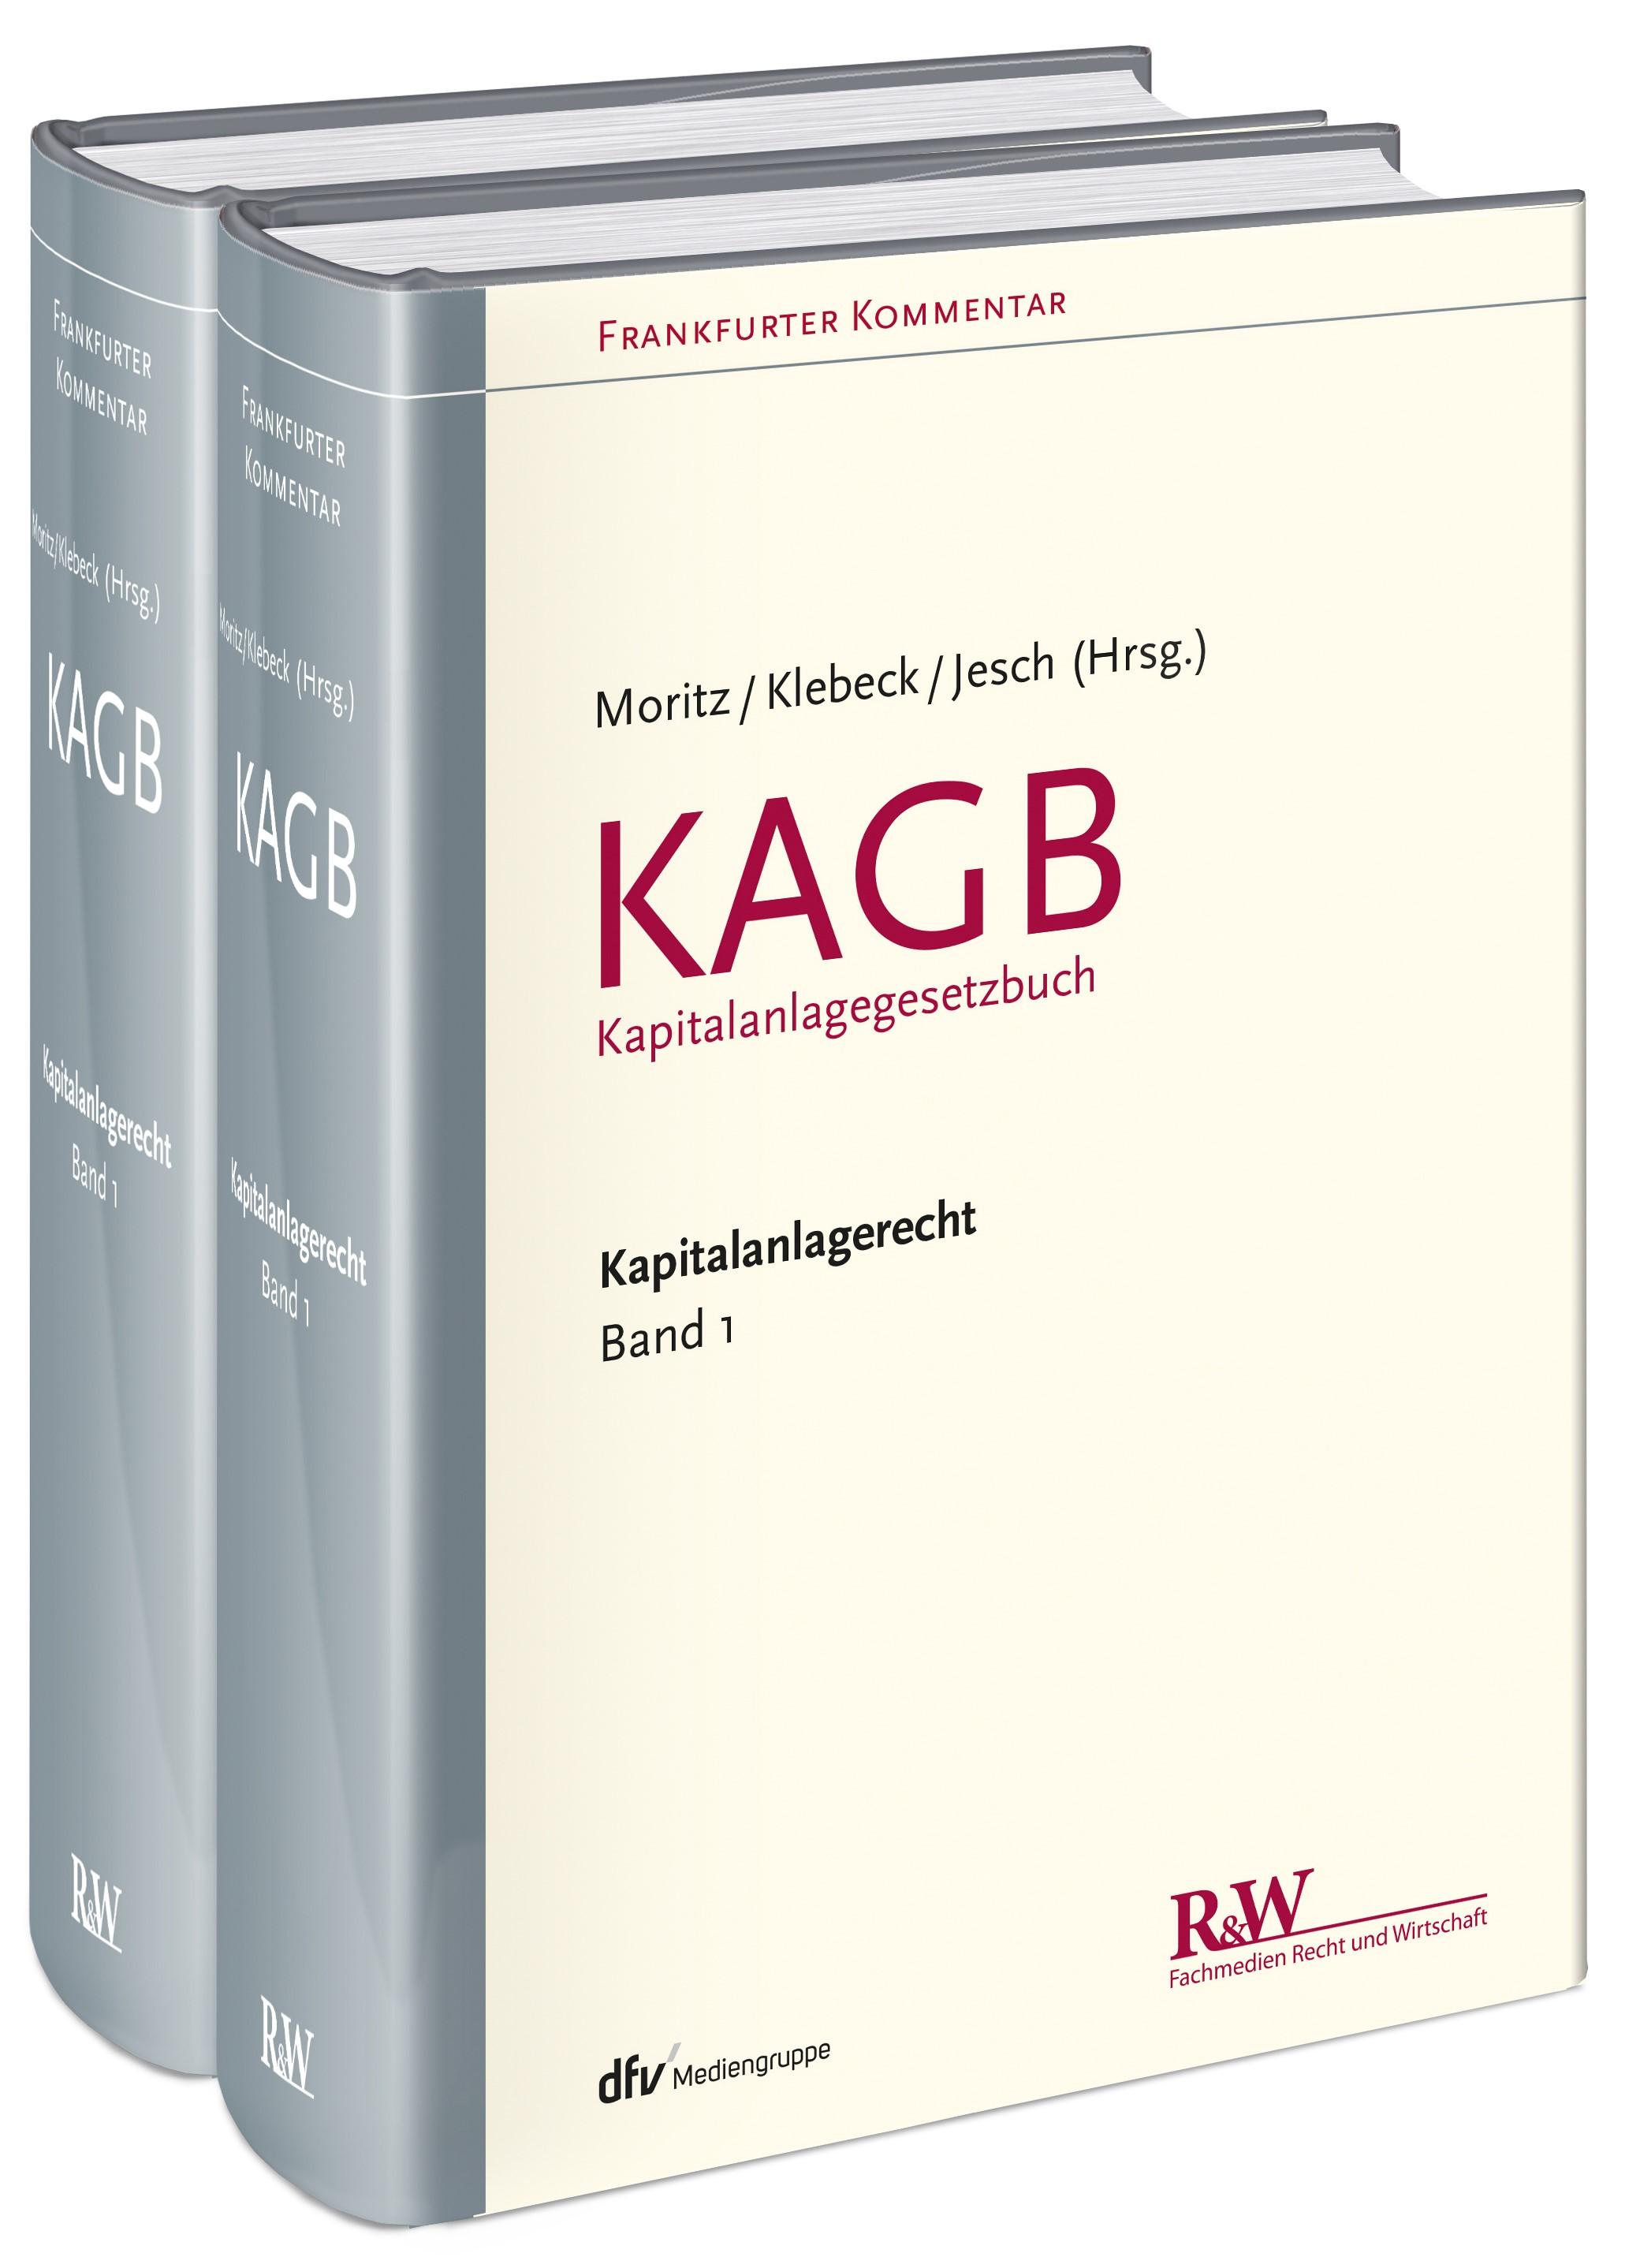 Abbildung von Moritz / Klebeck / Jesch (Hrsg.) | Frankfurter Kommentar zum Kapitalanlagerecht: Band 1: KAGB (Kapitalanlagegesetzbuch) | 2016